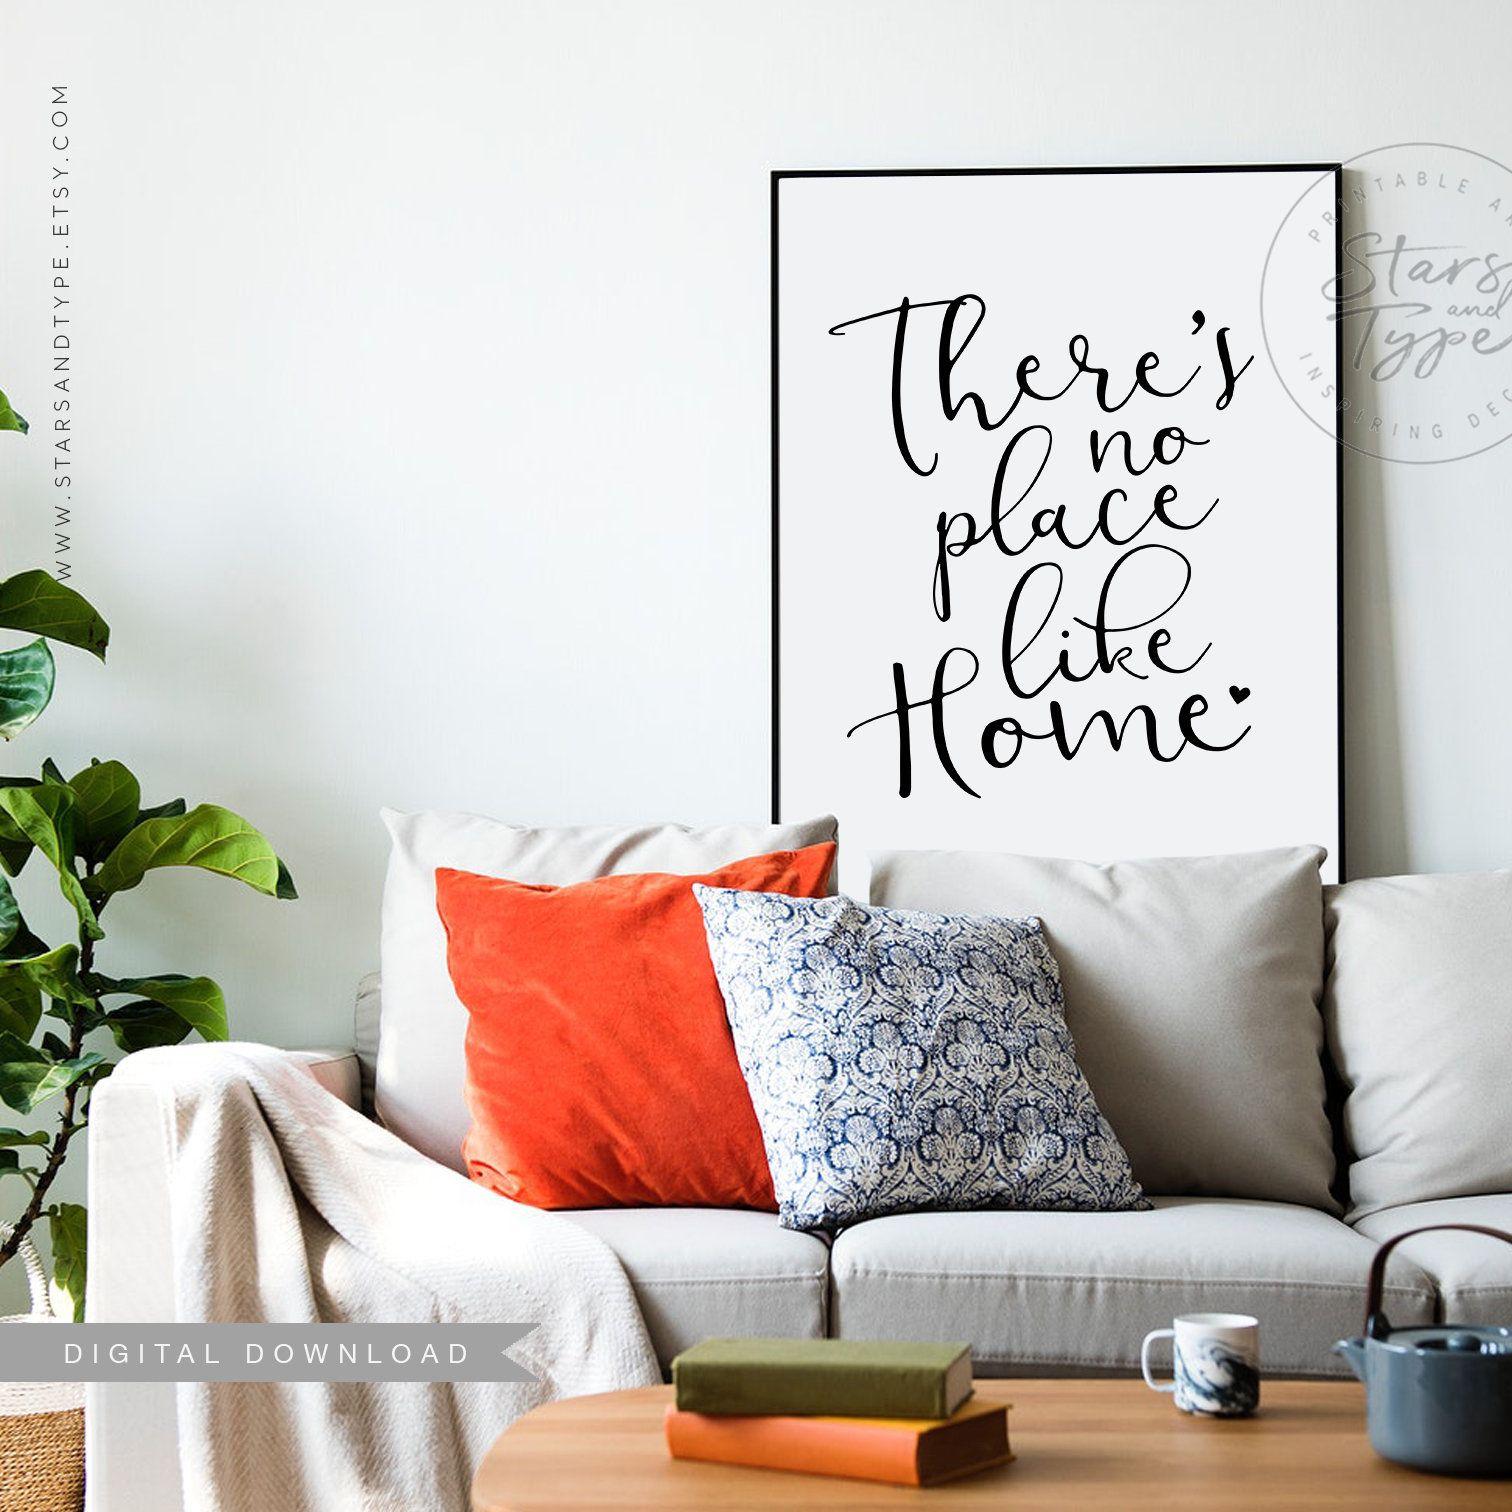 new home housewarming gift housewarming custom cushion custom livingroom decor decorative small pillow cozy home scandi home decor